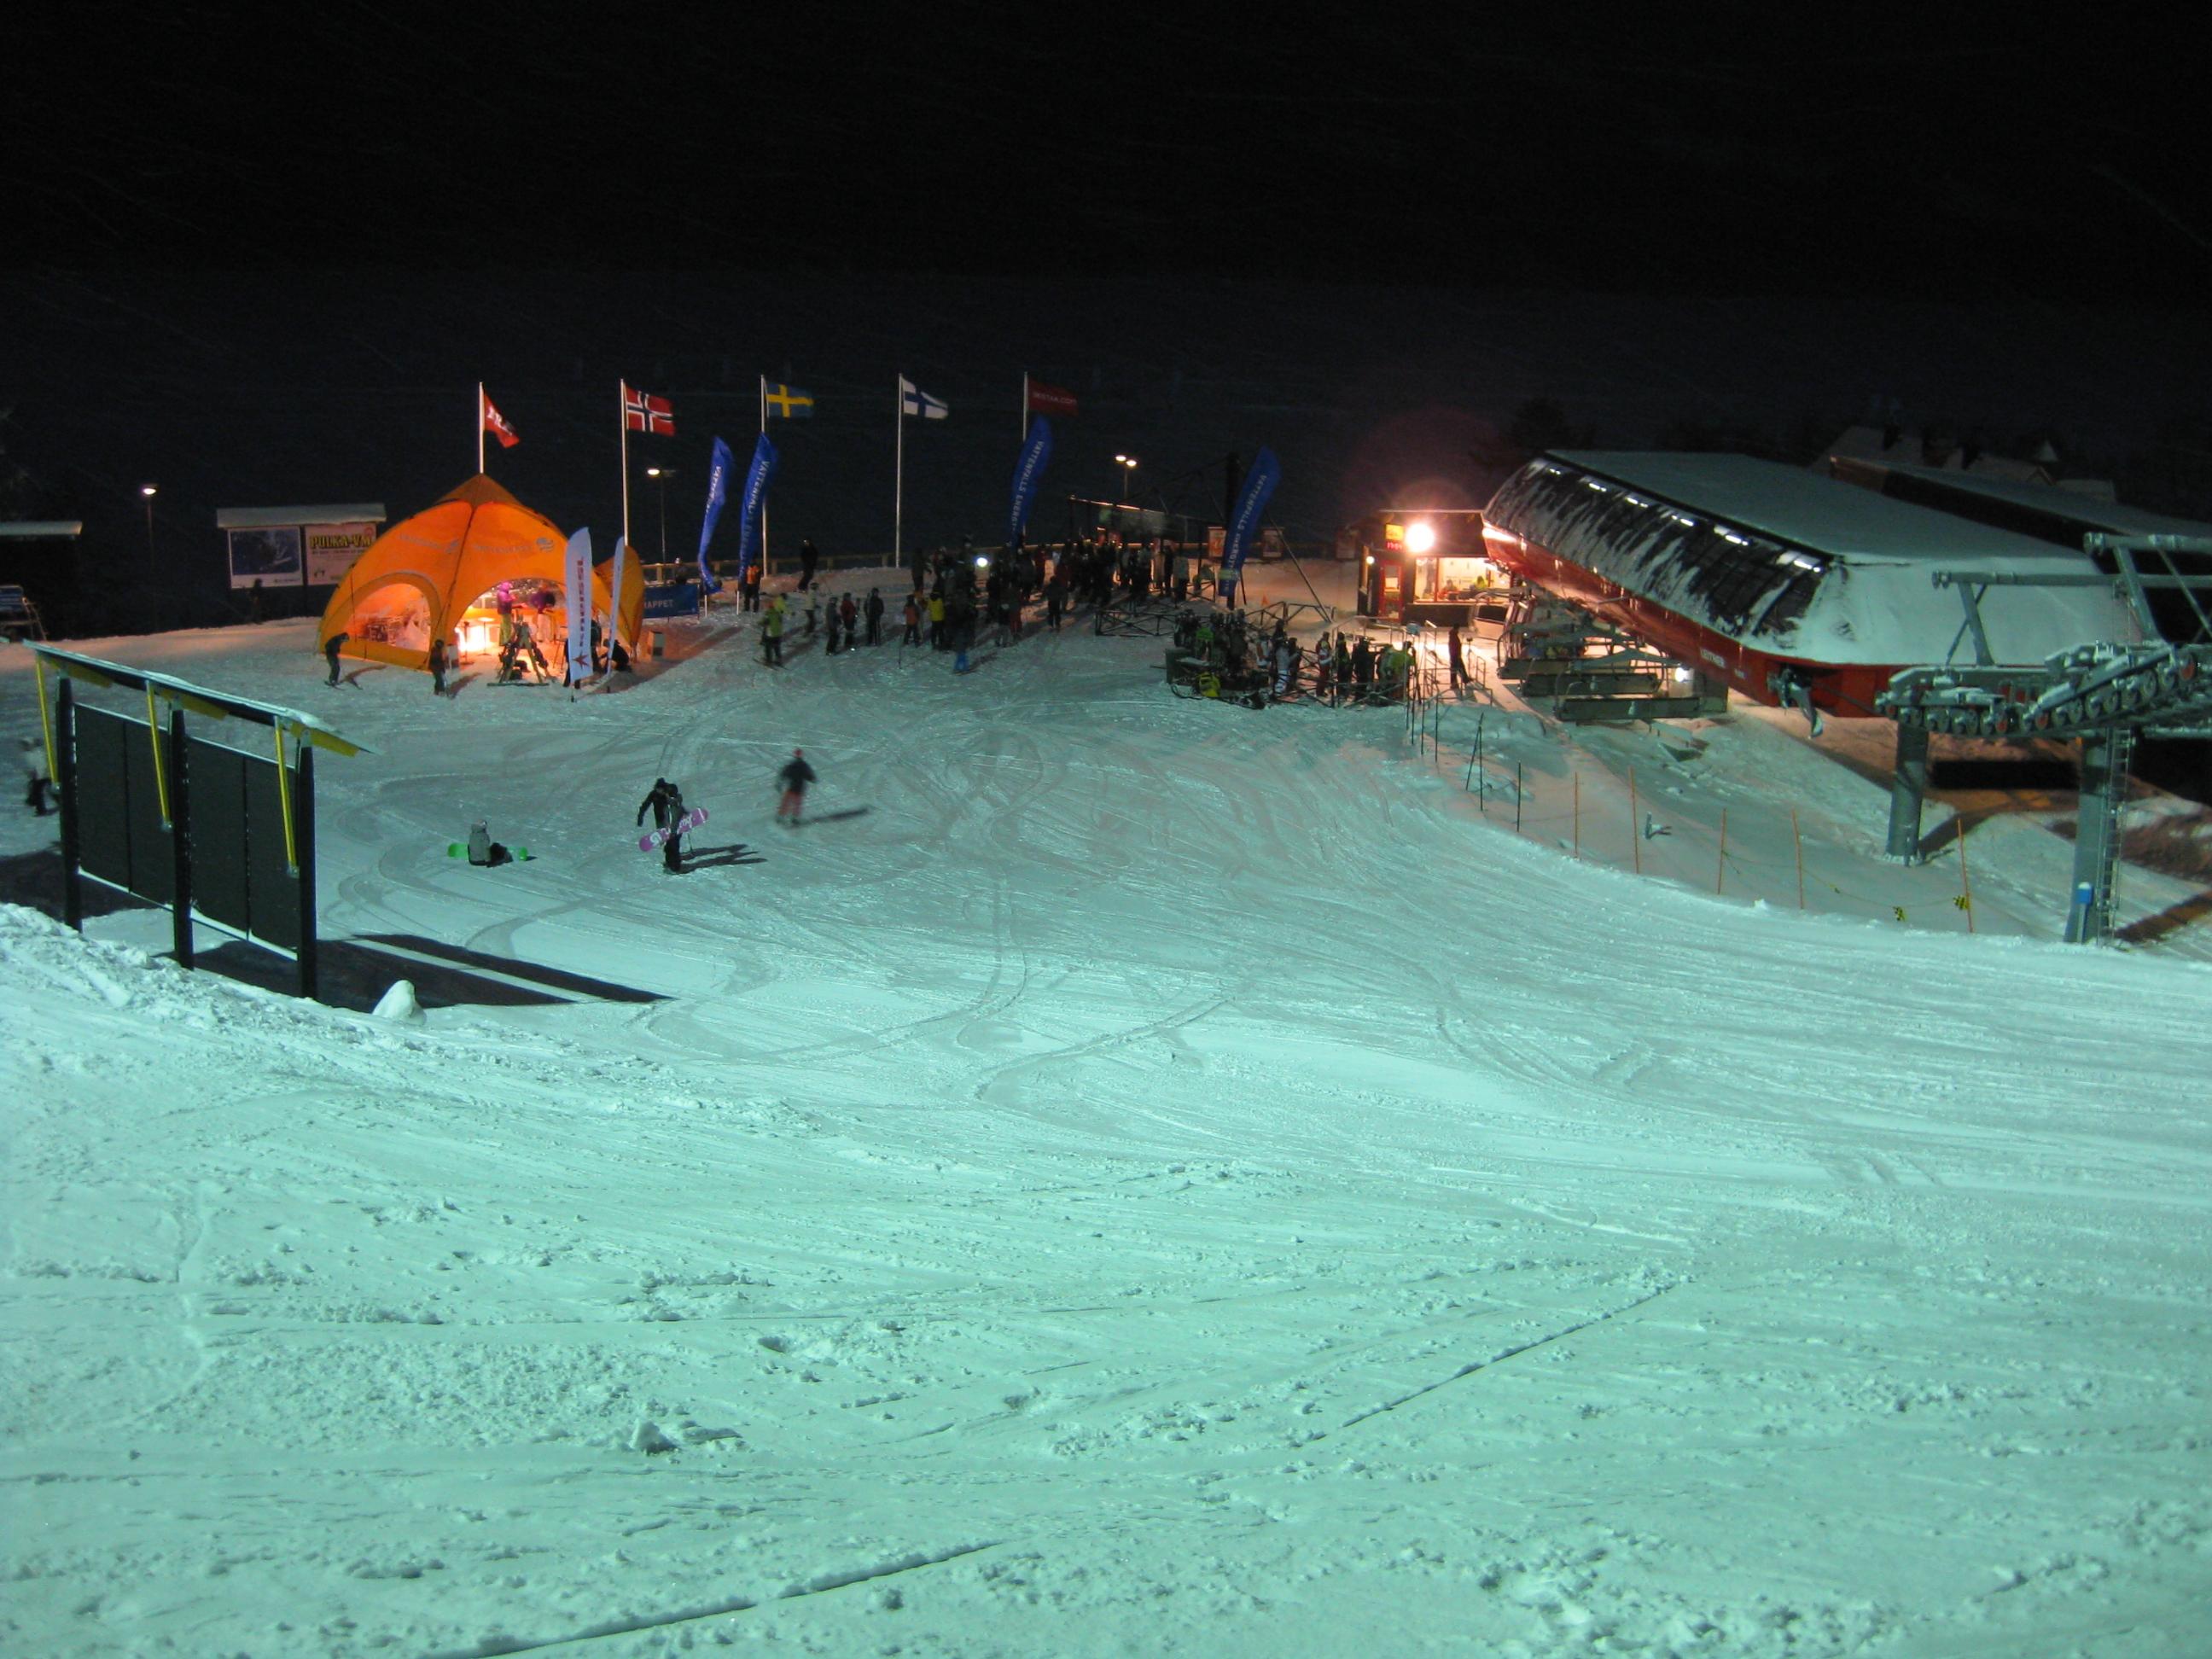 Evening skiing, Åre